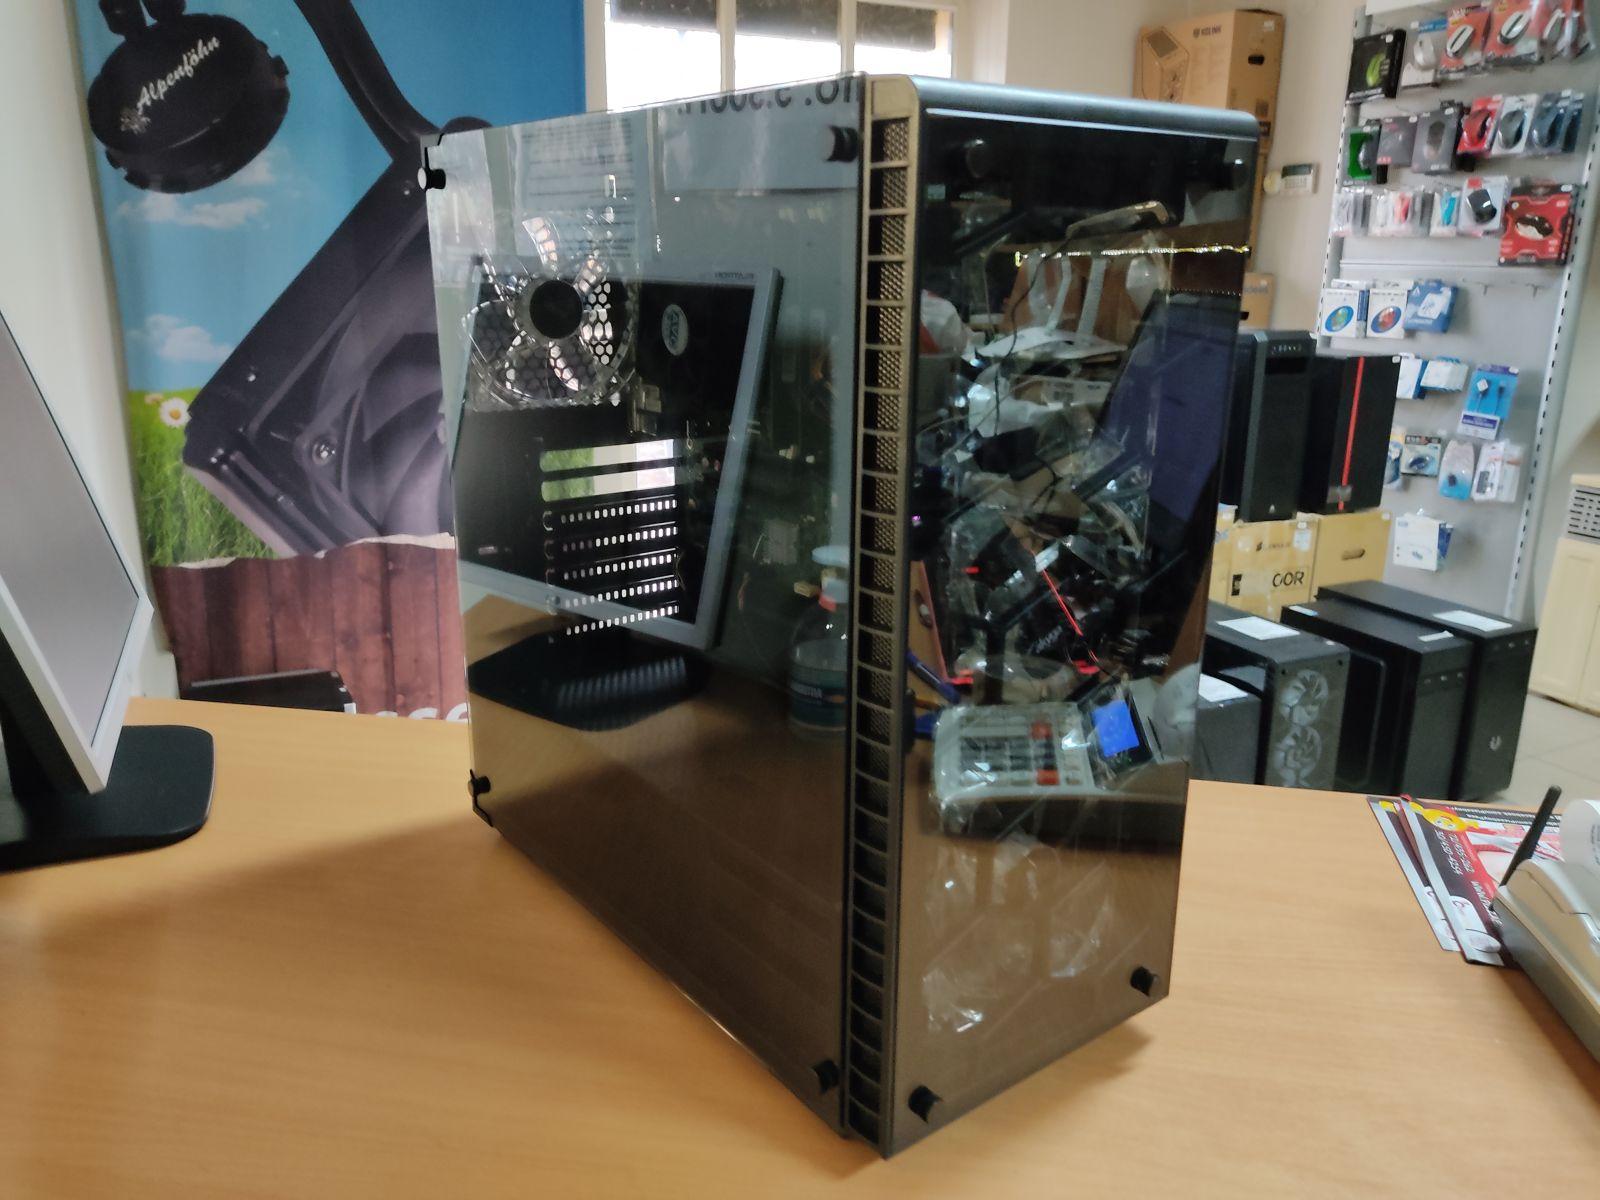 Observatory Blue Intel i3 7100 / 8 GB / 256GB  SSD + 500GB HDD / Gigabyte 1050 2GB használt 3 hó gar!